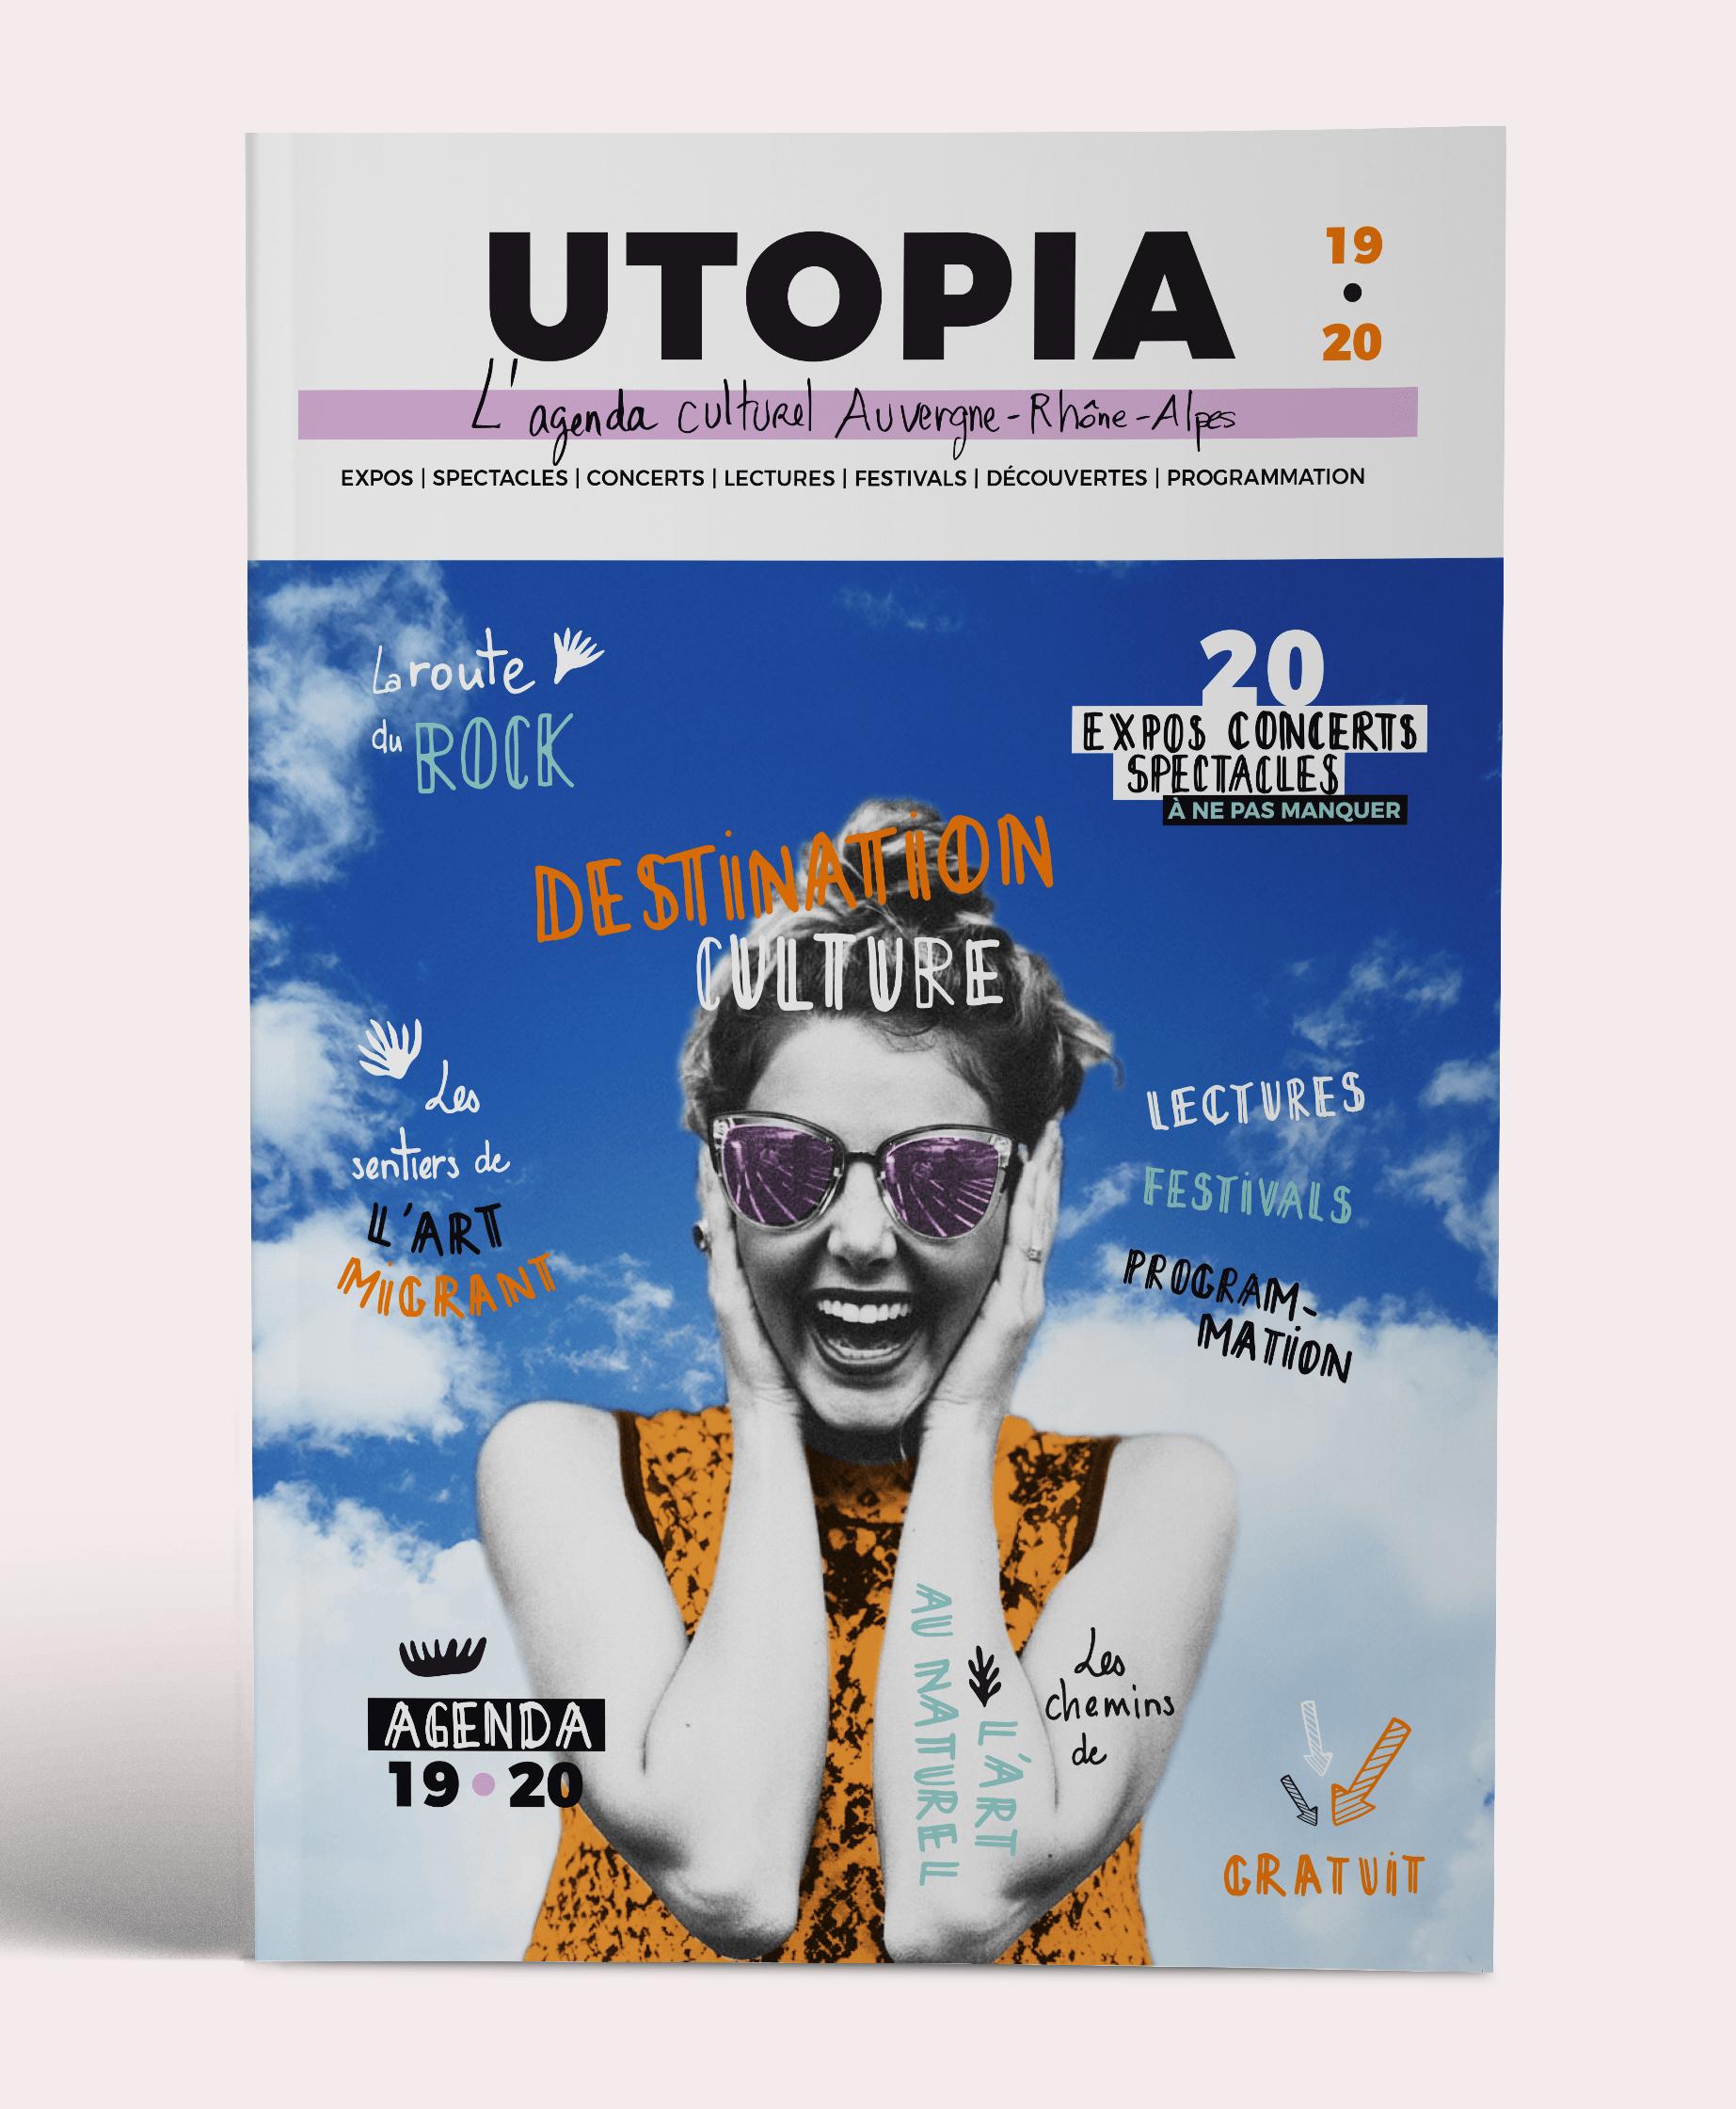 utopia agenda-19-20